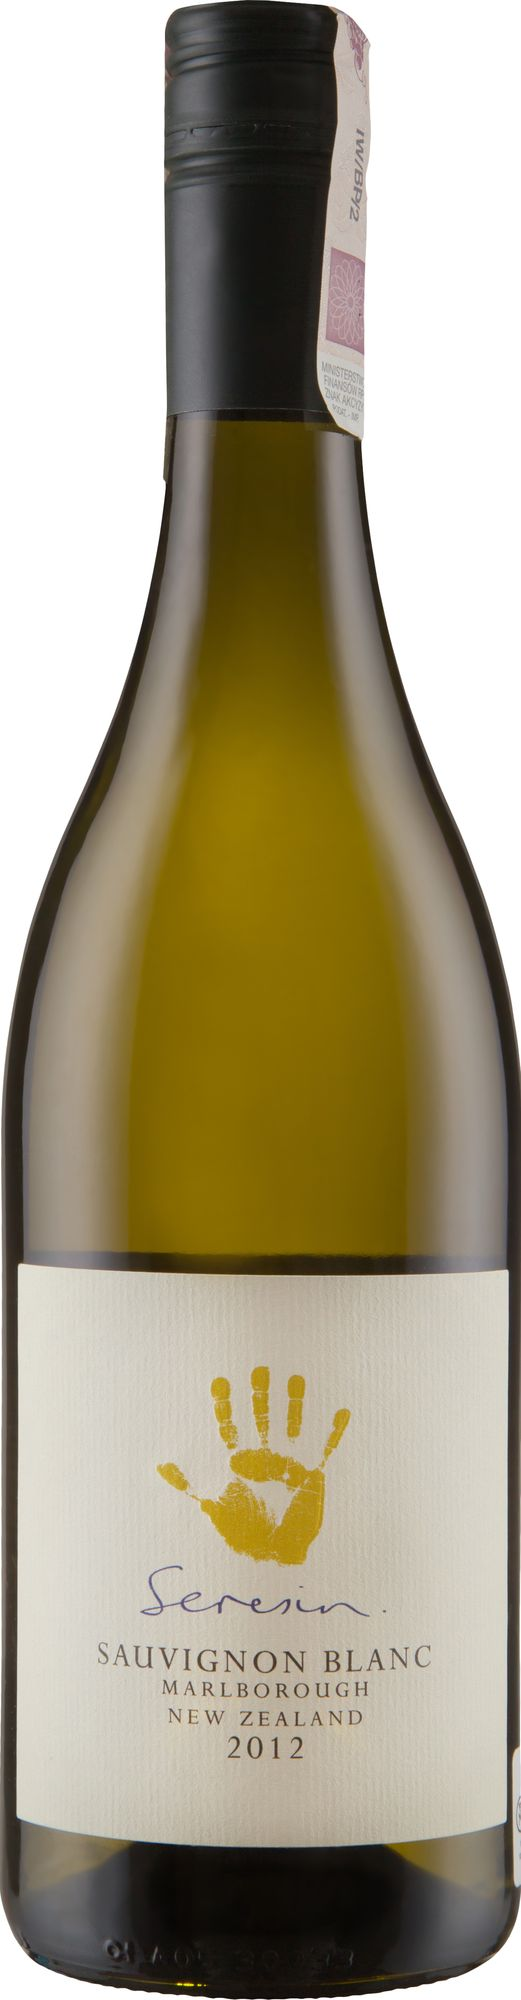 Wino Seresin Sauvignon Blanc